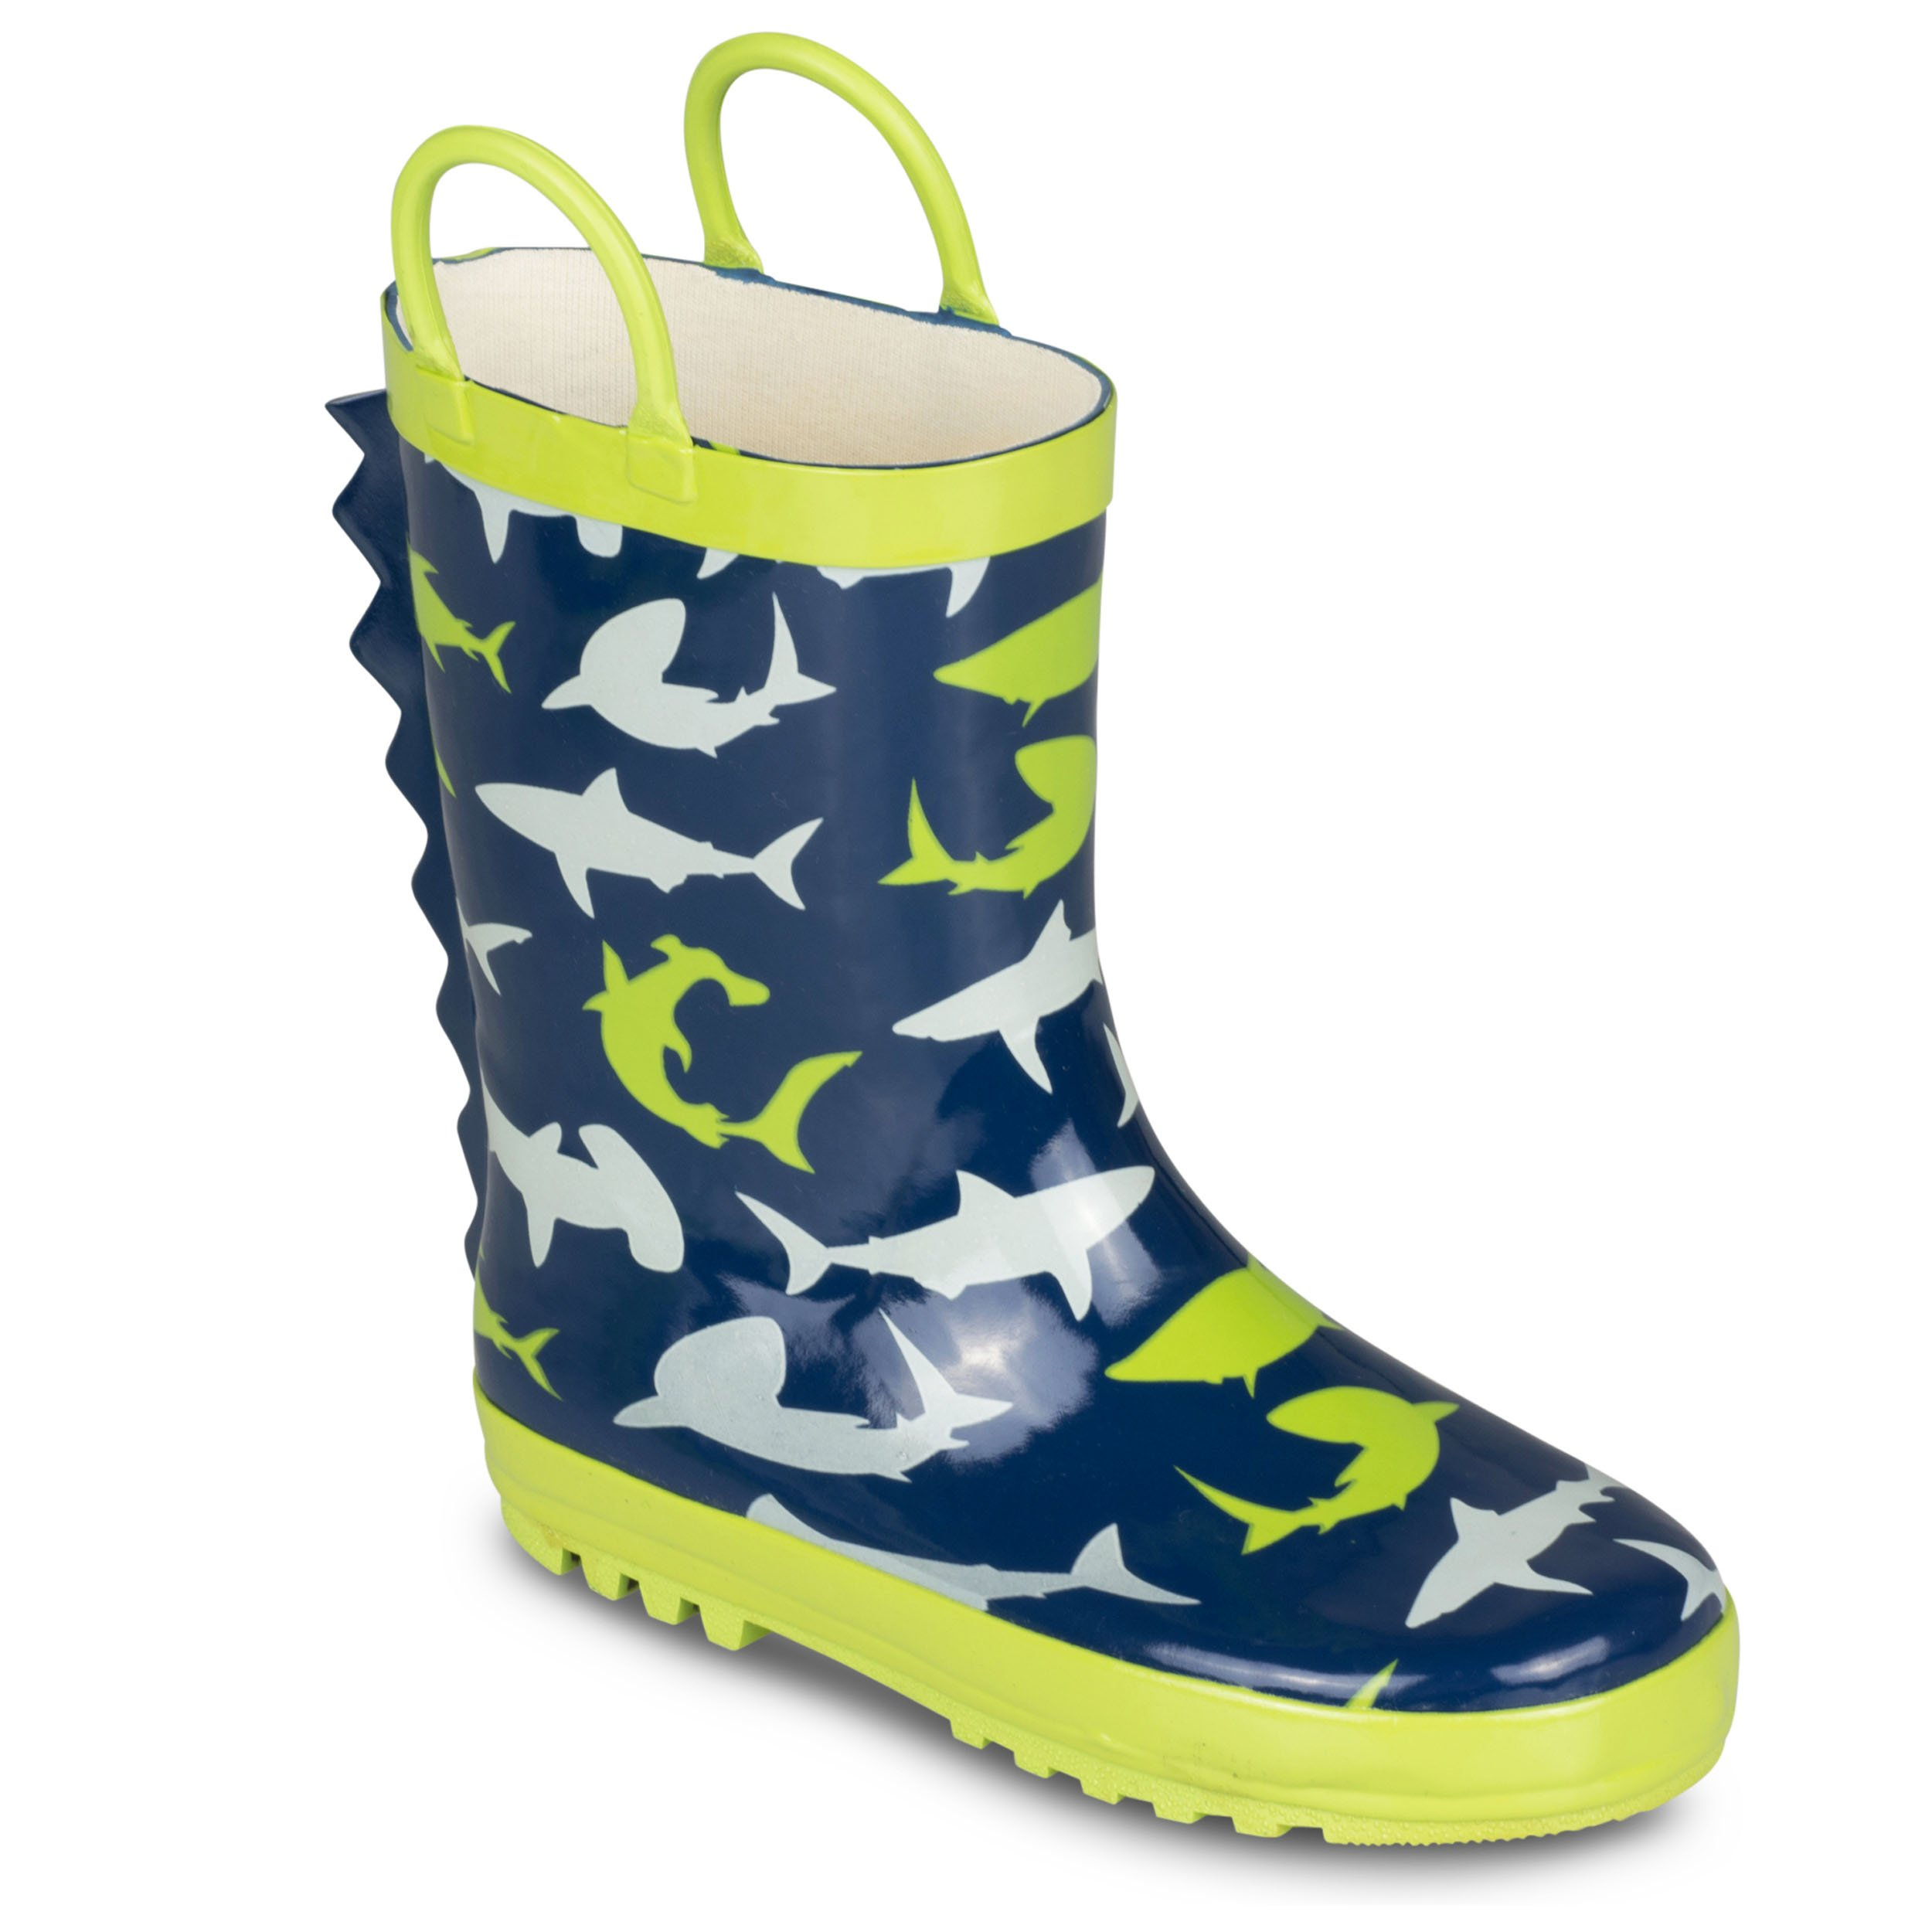 [SBR702-SHARKPRINT-T7] Boys Rain Boots Shark Print Easy On Toddlers Size 7